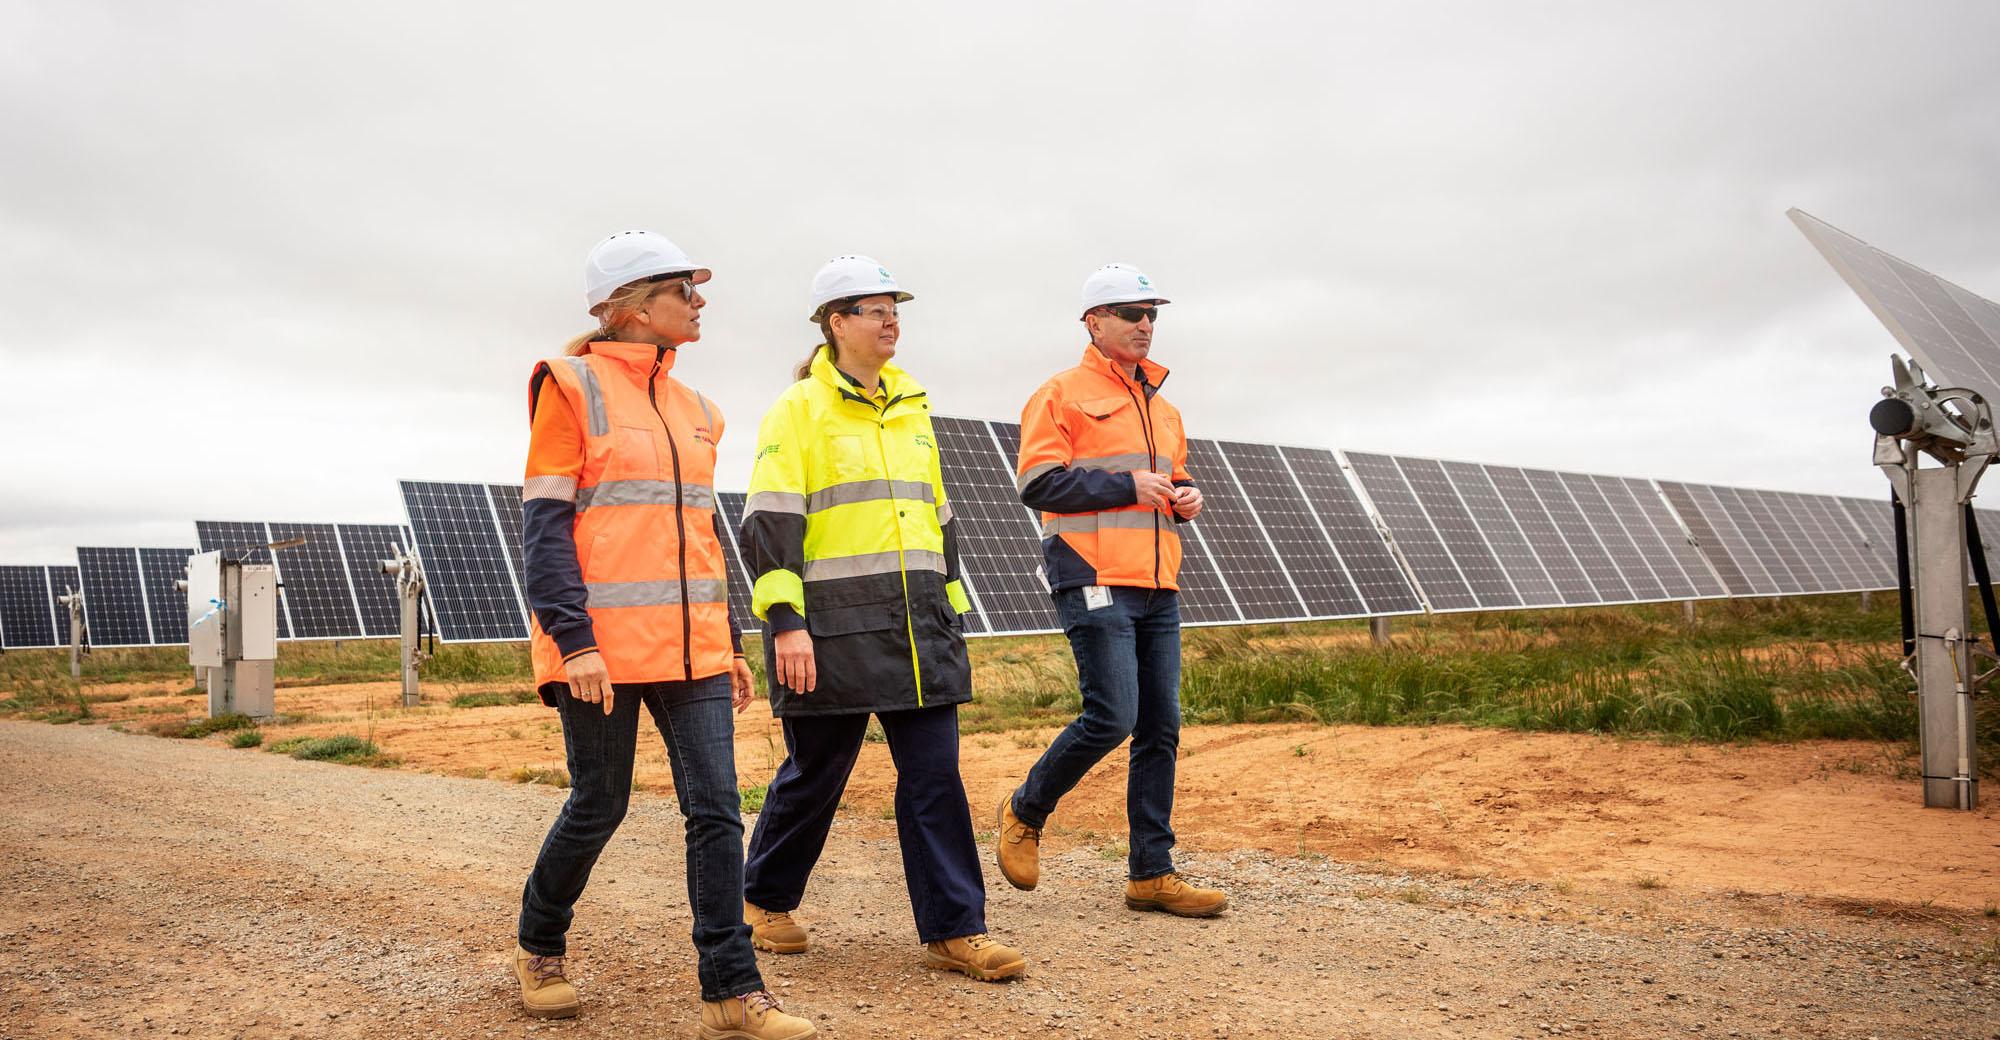 solar-panels-image